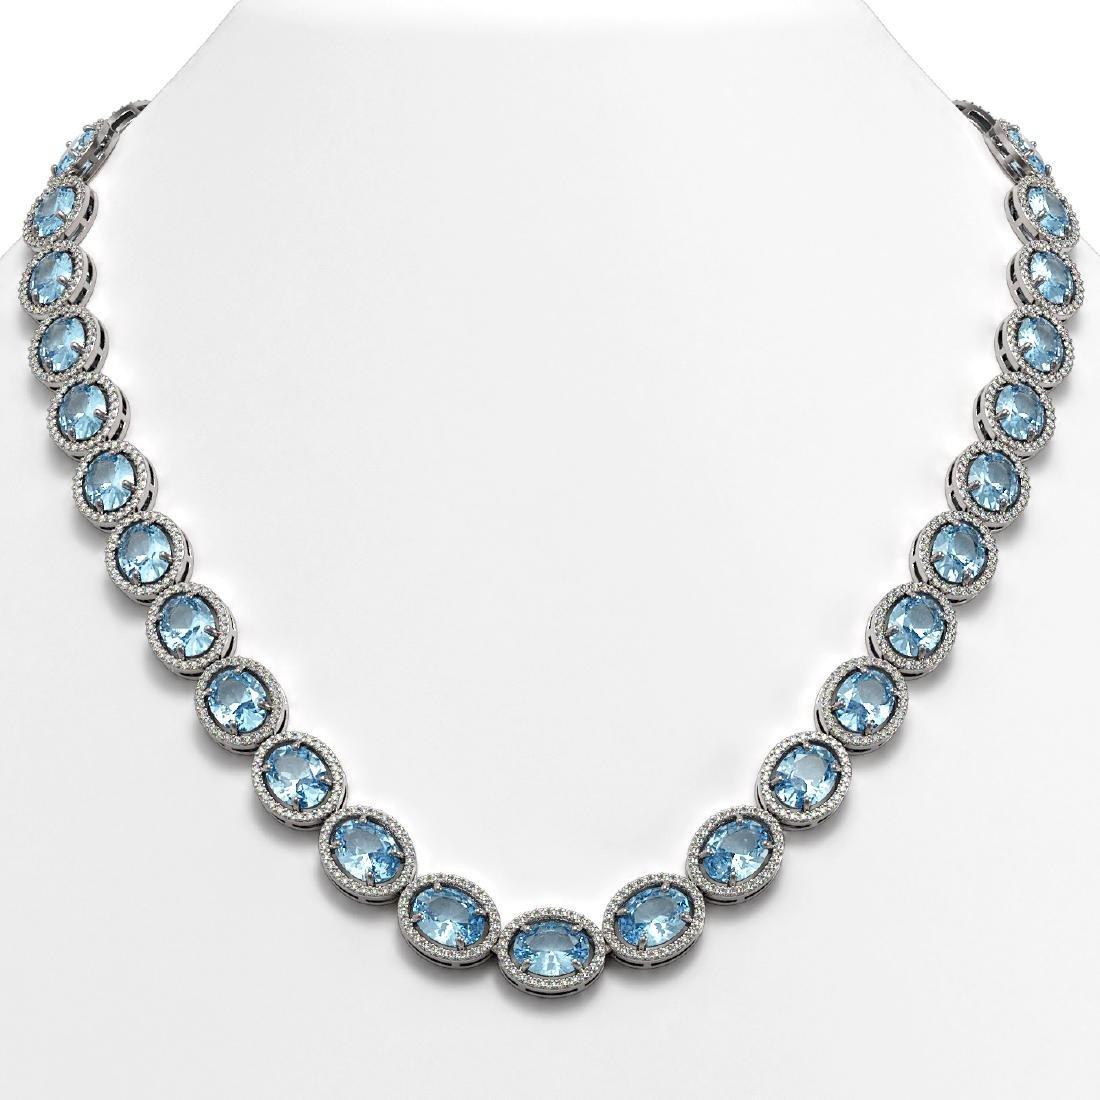 54.11 CTW Aquamarine & Diamond Necklace White Gold 10K